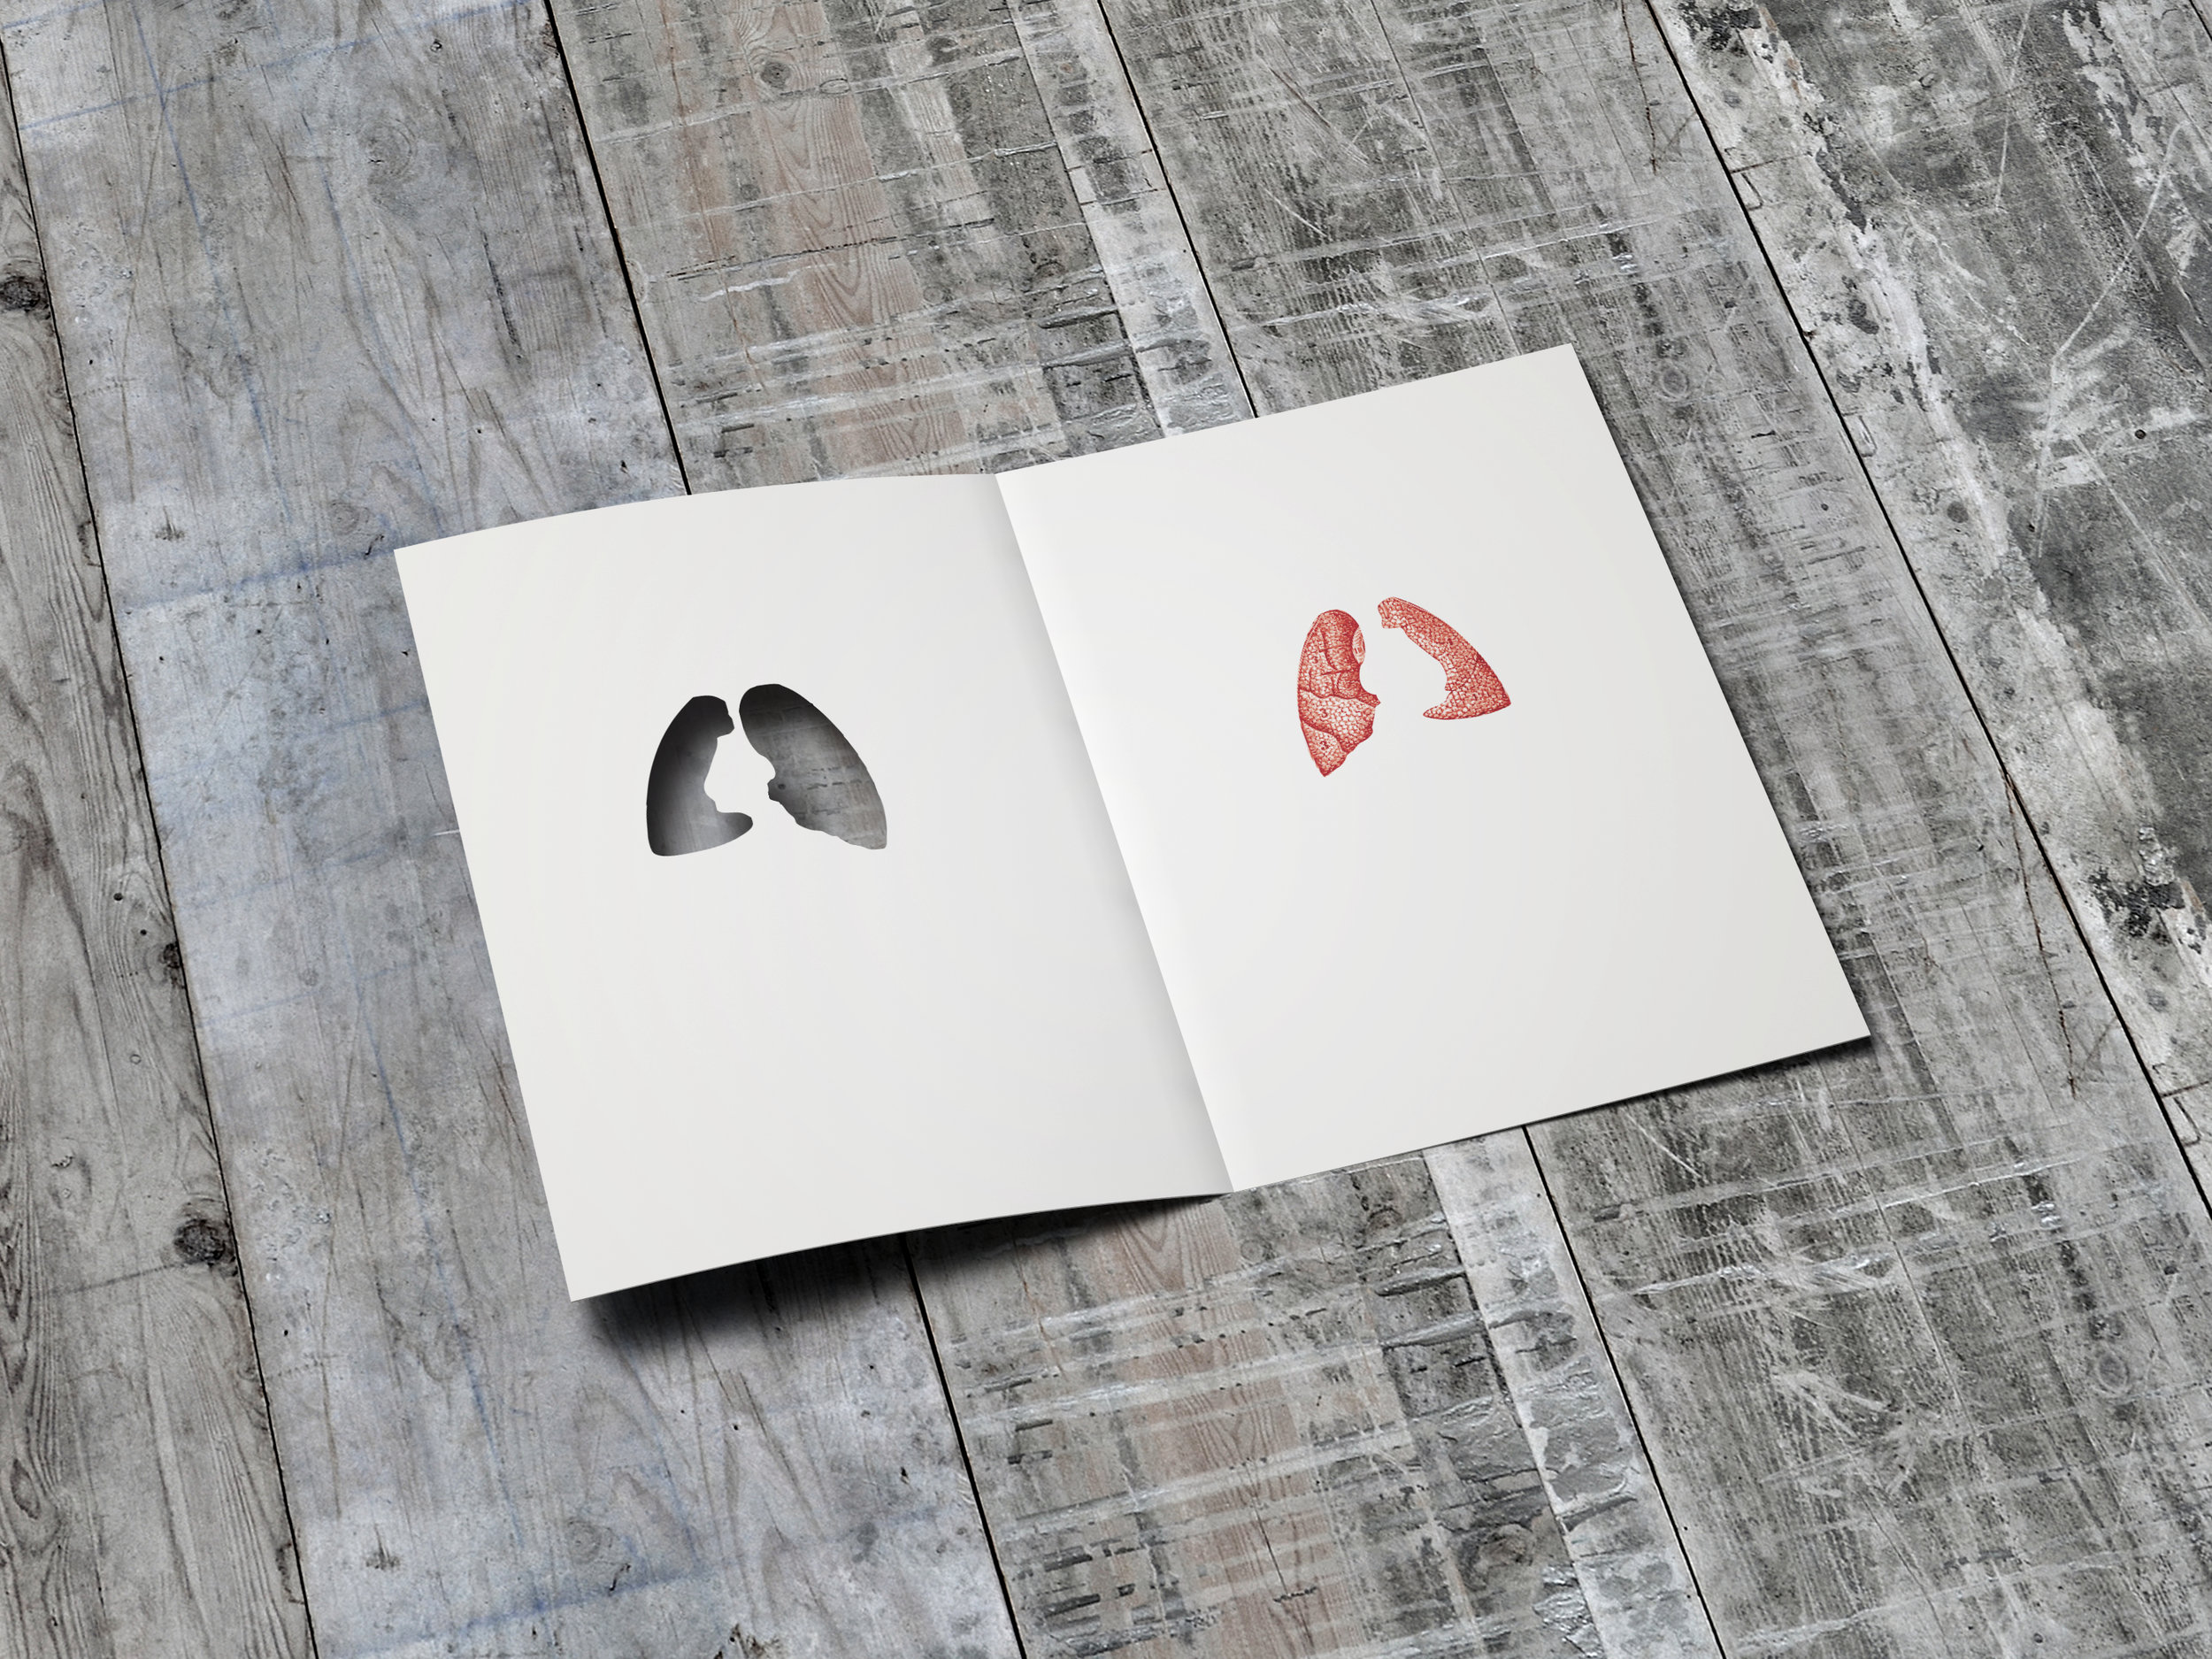 Lungs_010.jpg